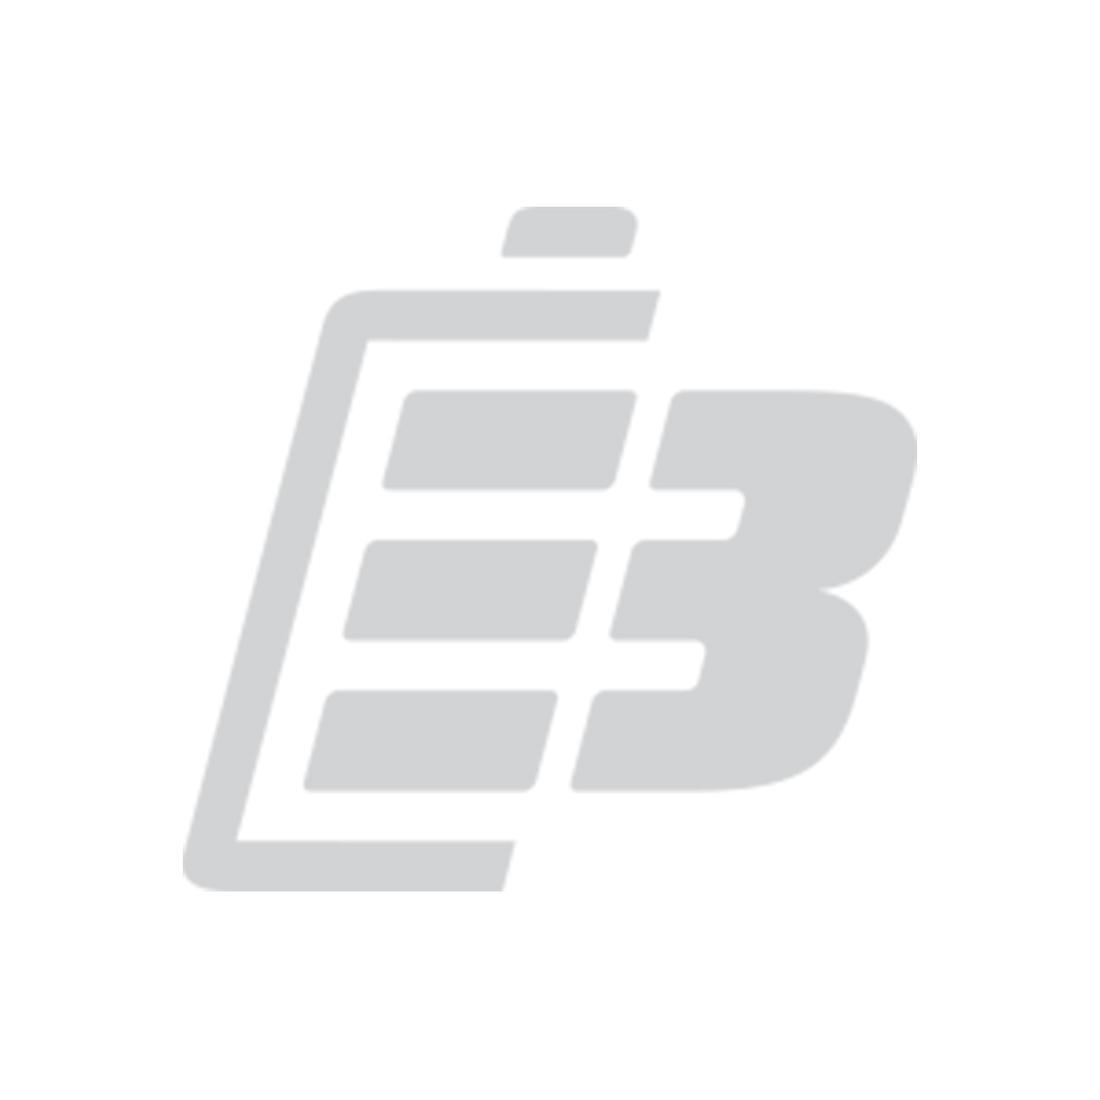 NPP Lead Acid Battery 12V 2.3Ah_1